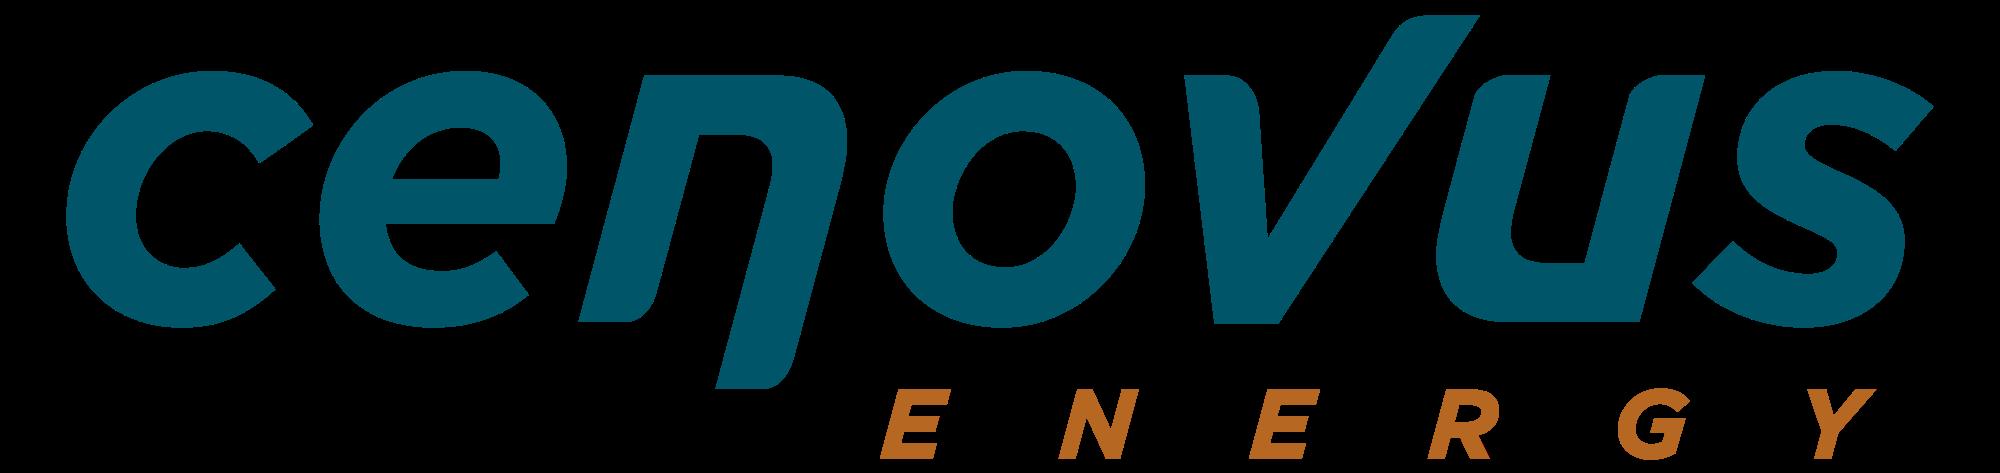 CENOVUS ENERGY ANNOUNCES JOB CUTS